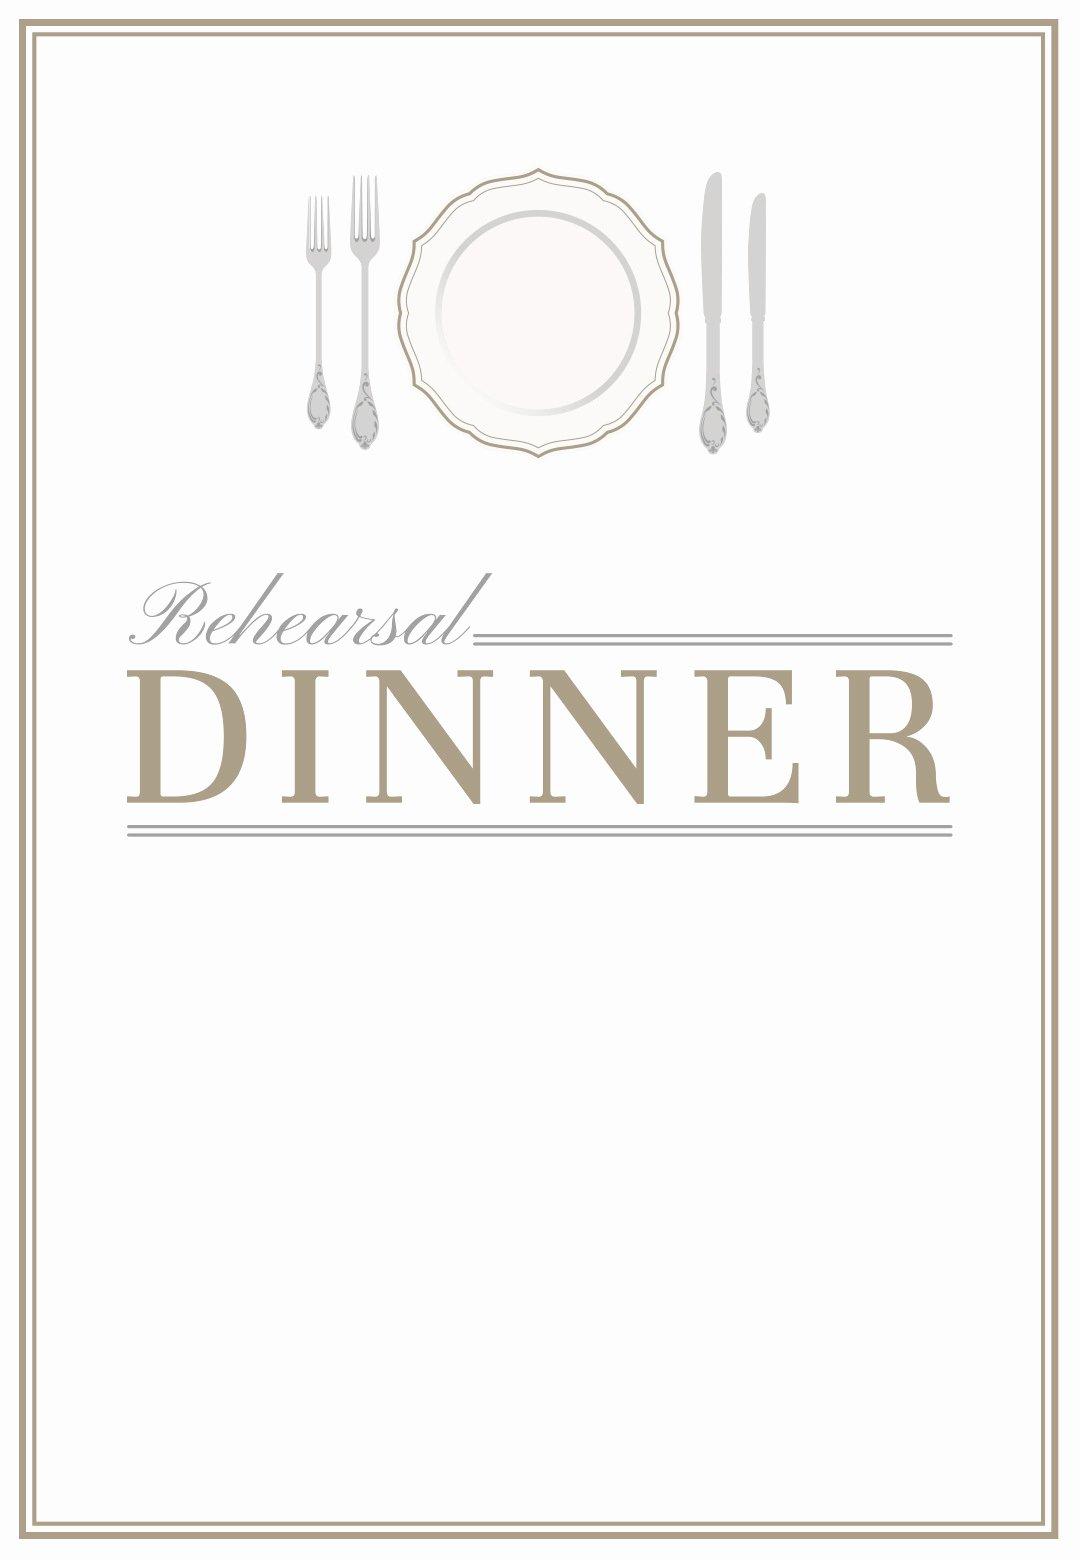 Dinner Invite Template Word Unique Dinner Invitation Templates Free Printable Templates